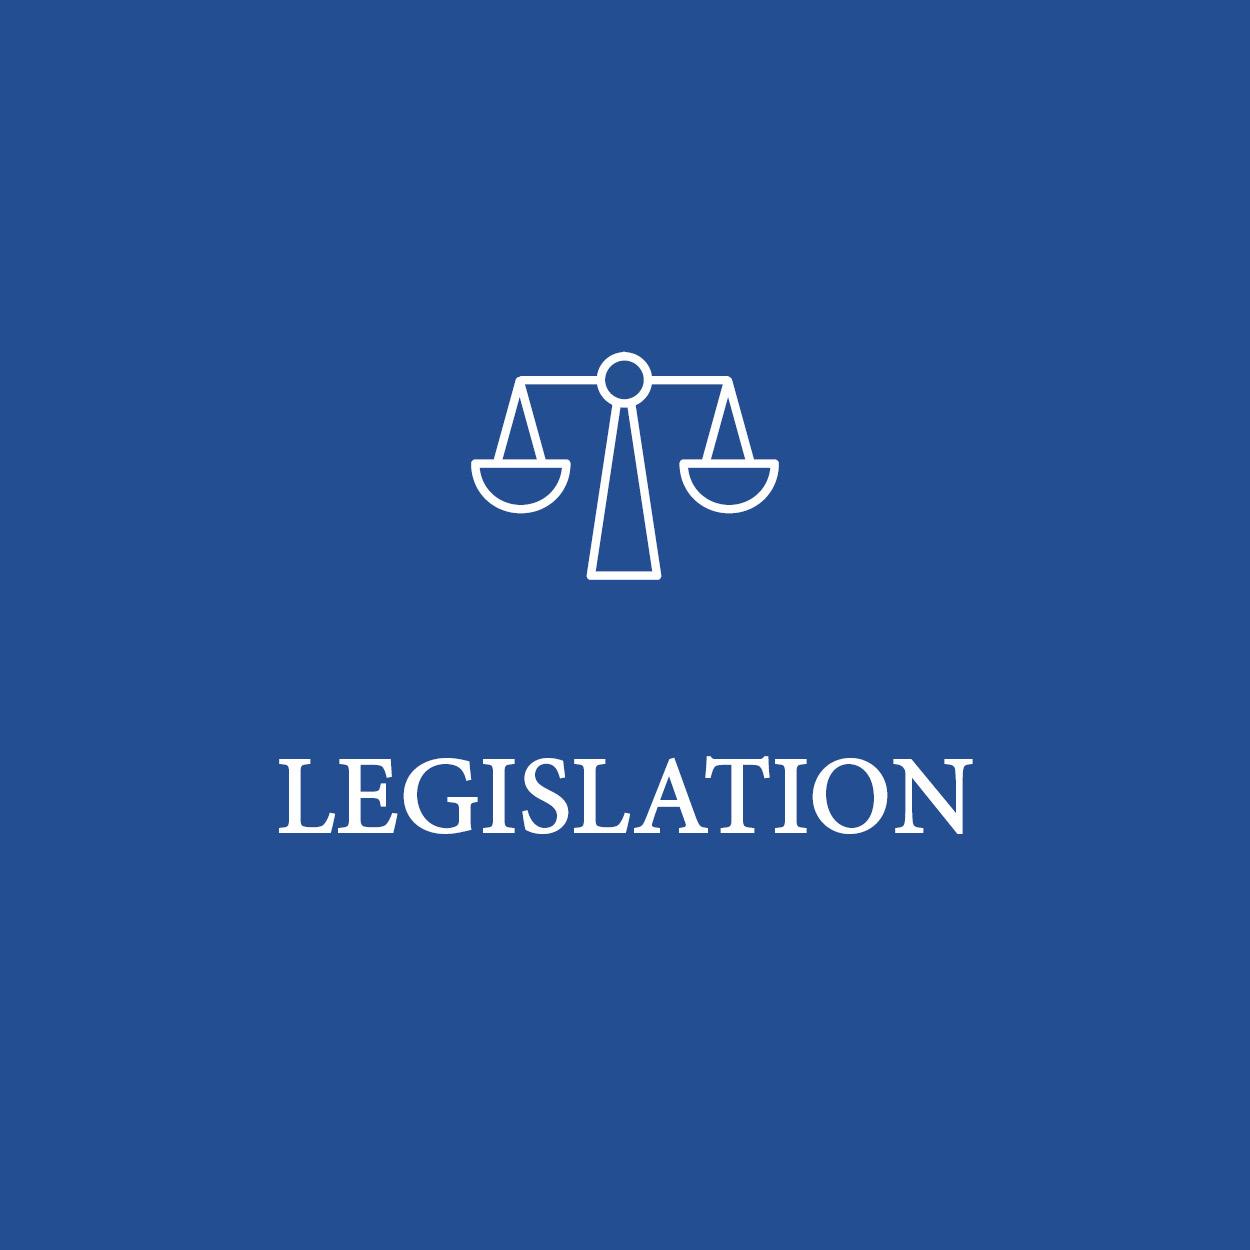 bettershoesfoundation_design_legislation